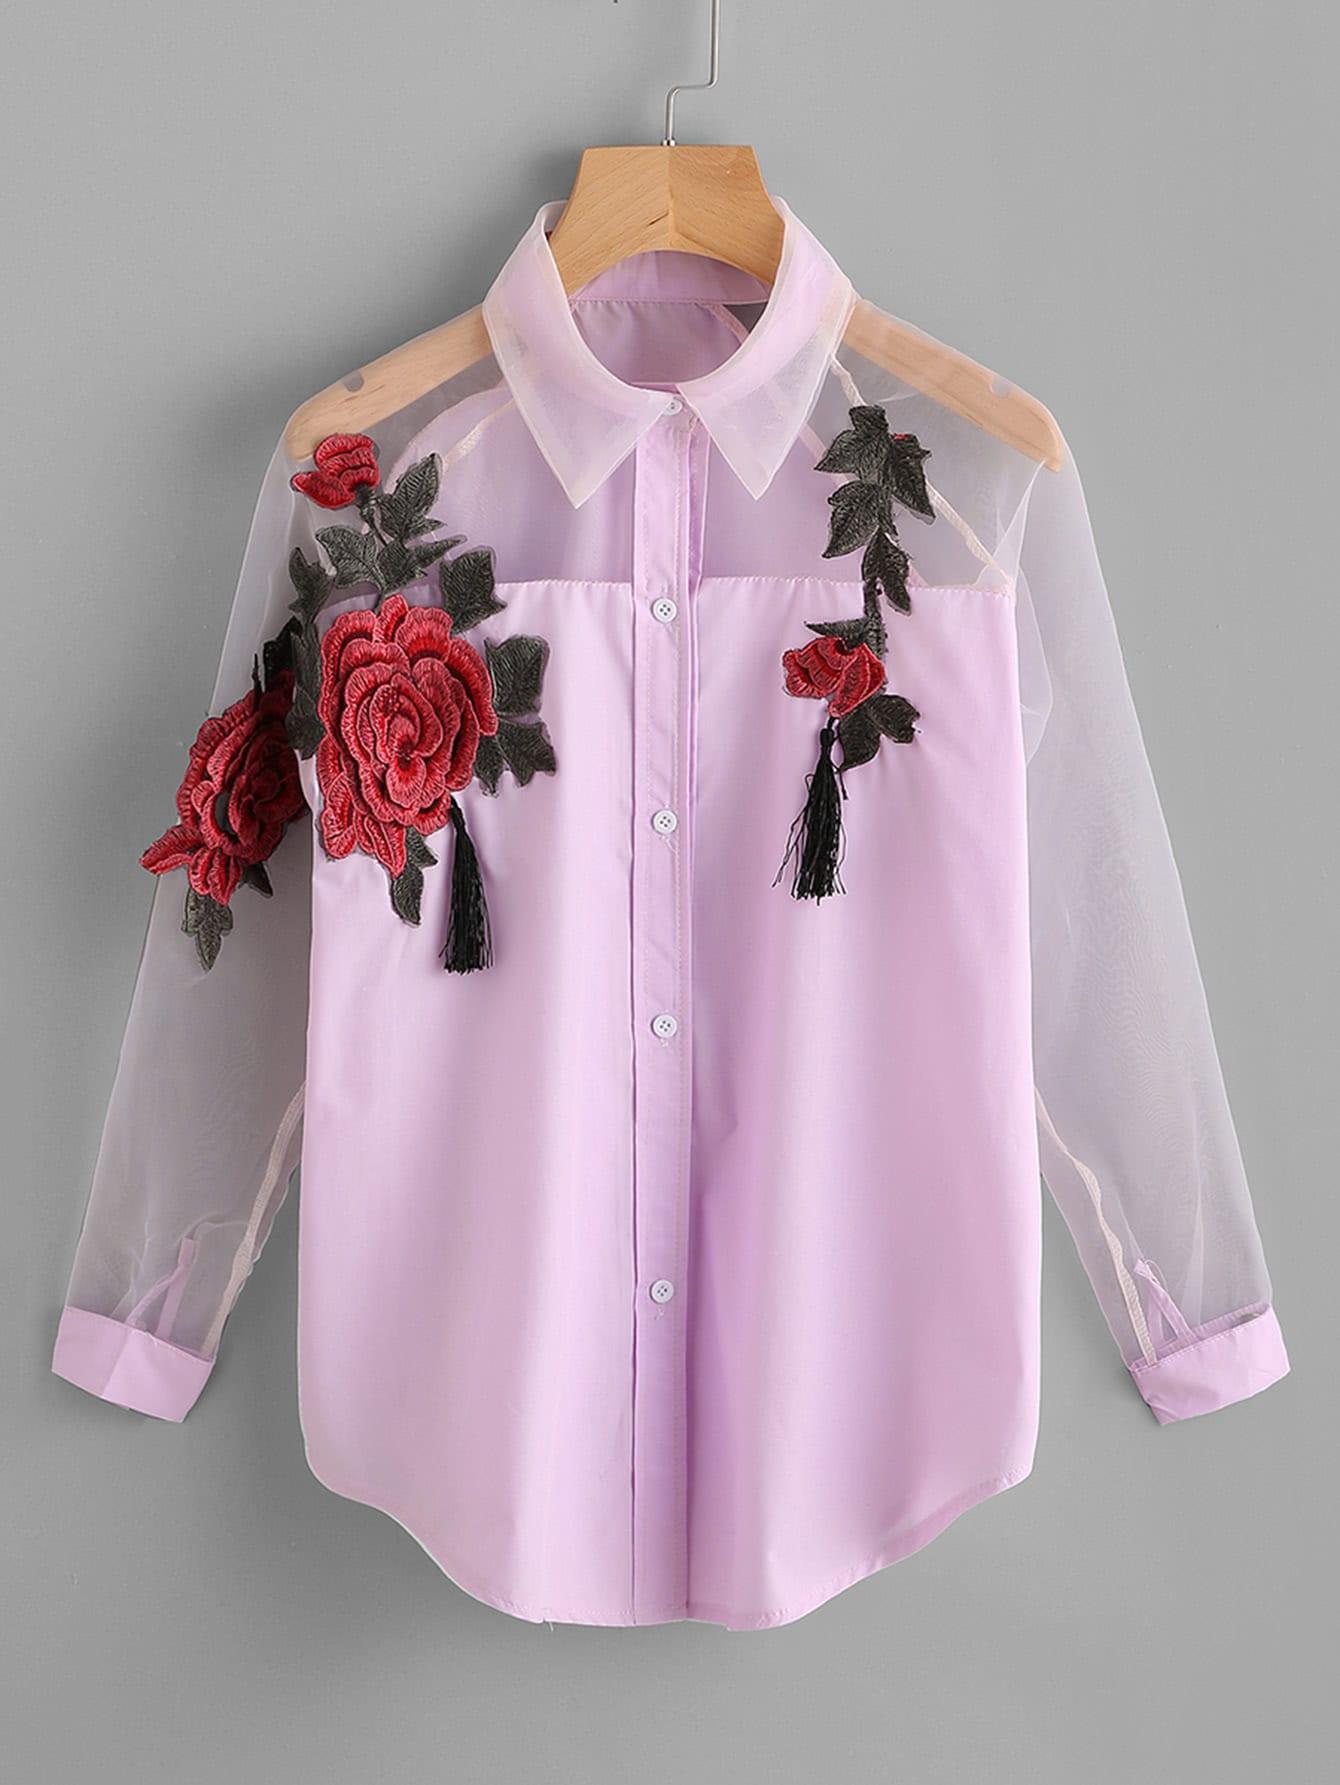 Фото Embroidered Appliques Tassel Detail Shirt With Sheer Mesh Panel. Купить с доставкой